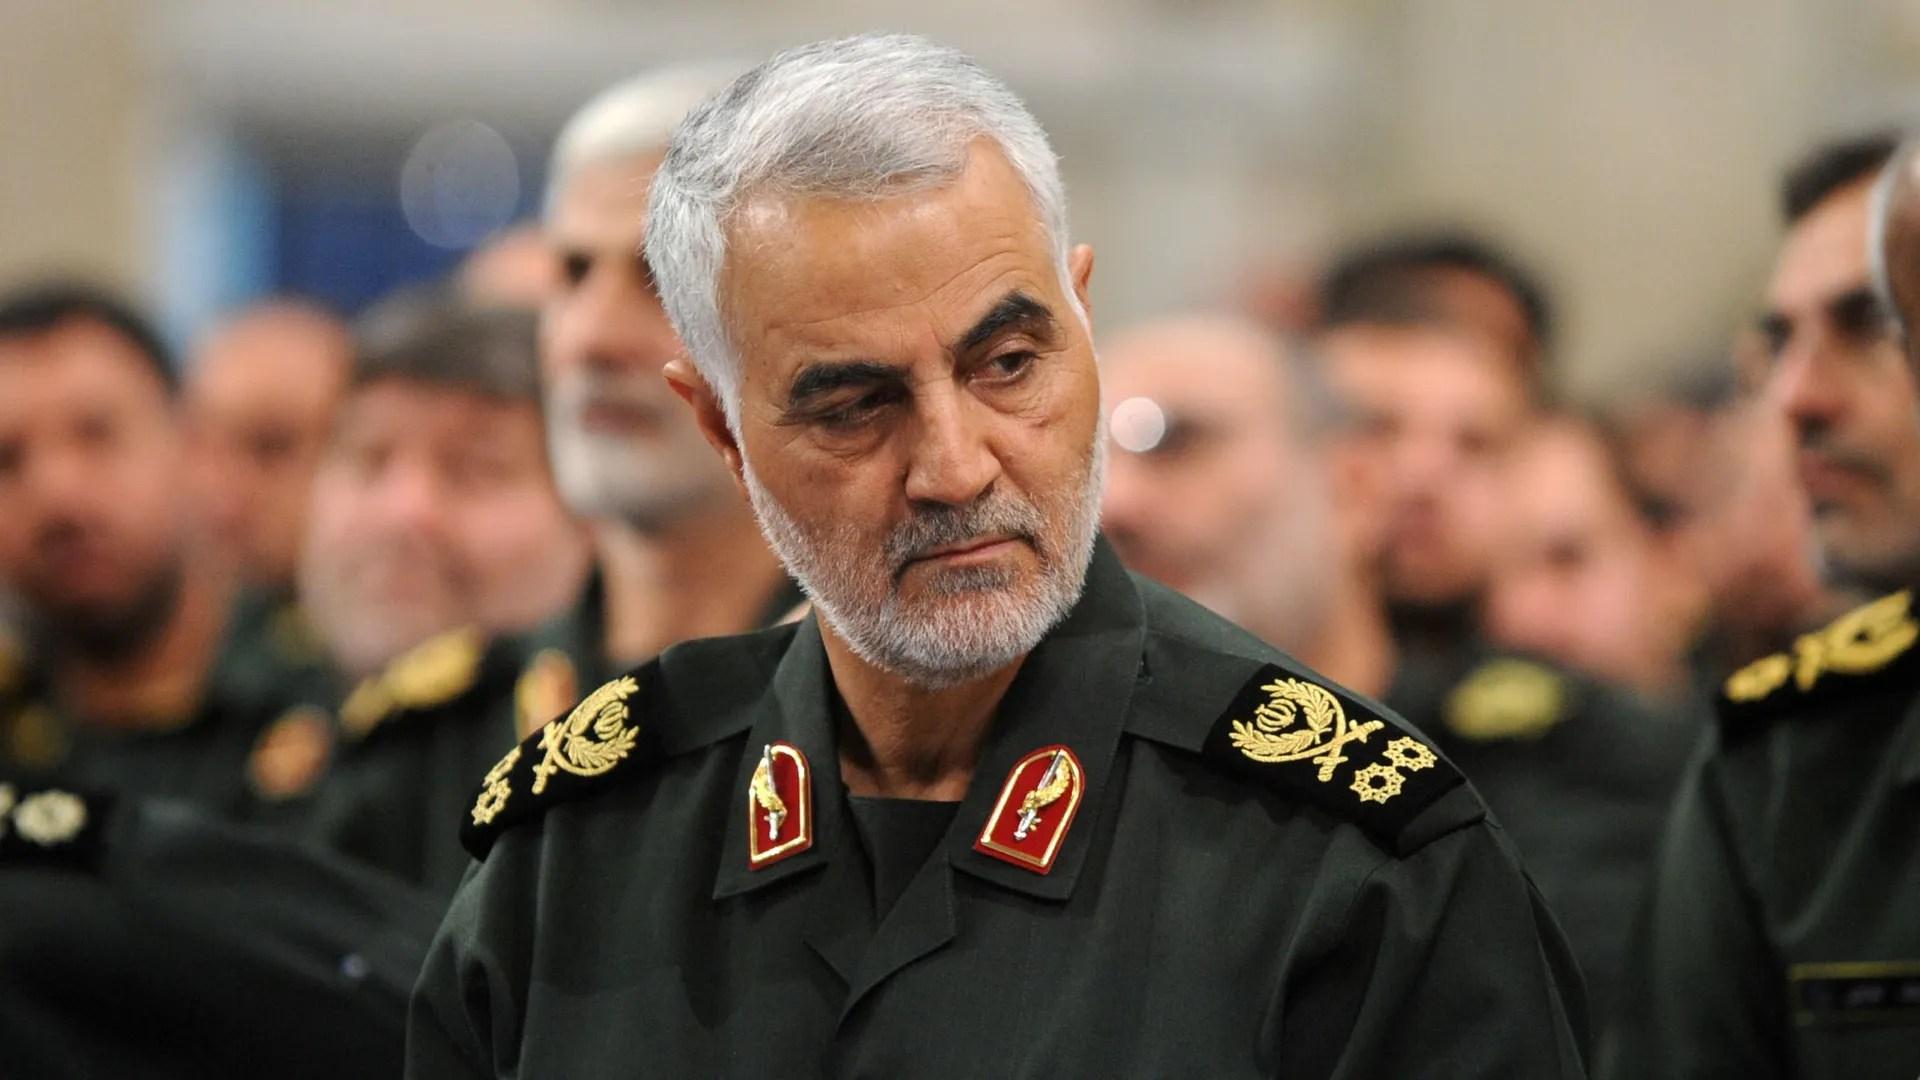 Why Qasem Soleimani, the Iranian general killed in a U.S. strike, mattered